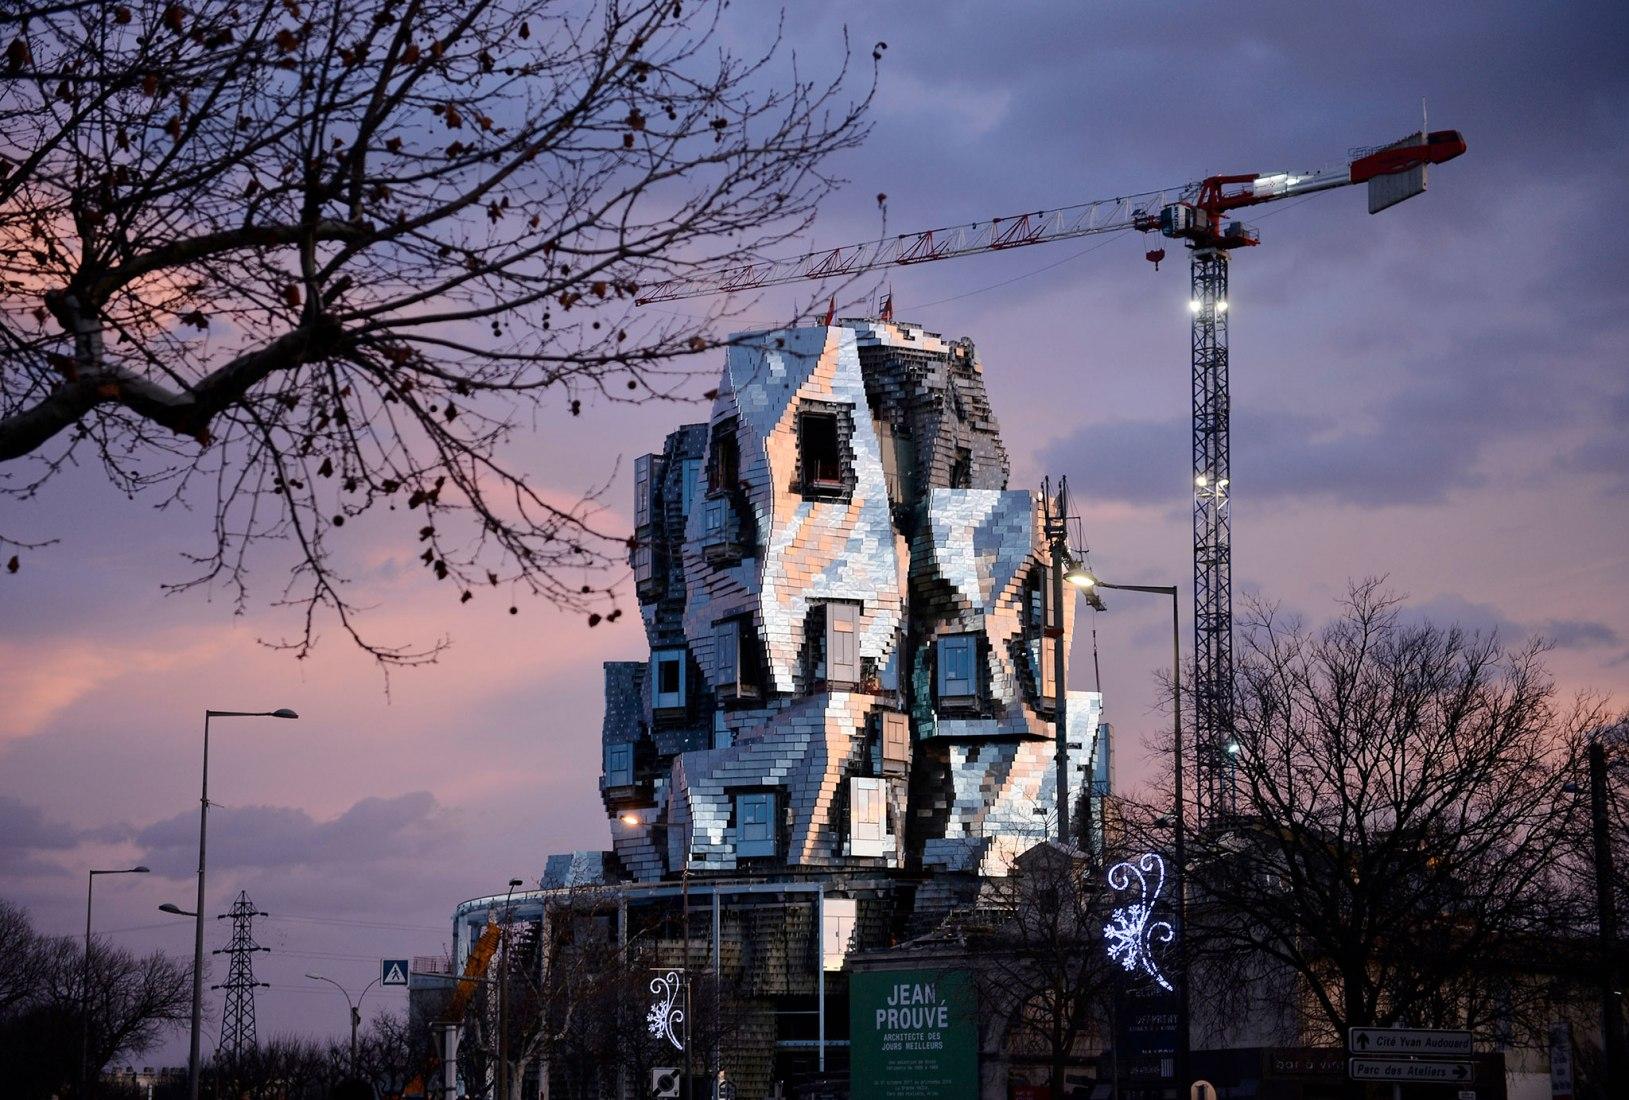 Torre Luma Arles de Frank Gehry. Fotografía por Hervé Hôte